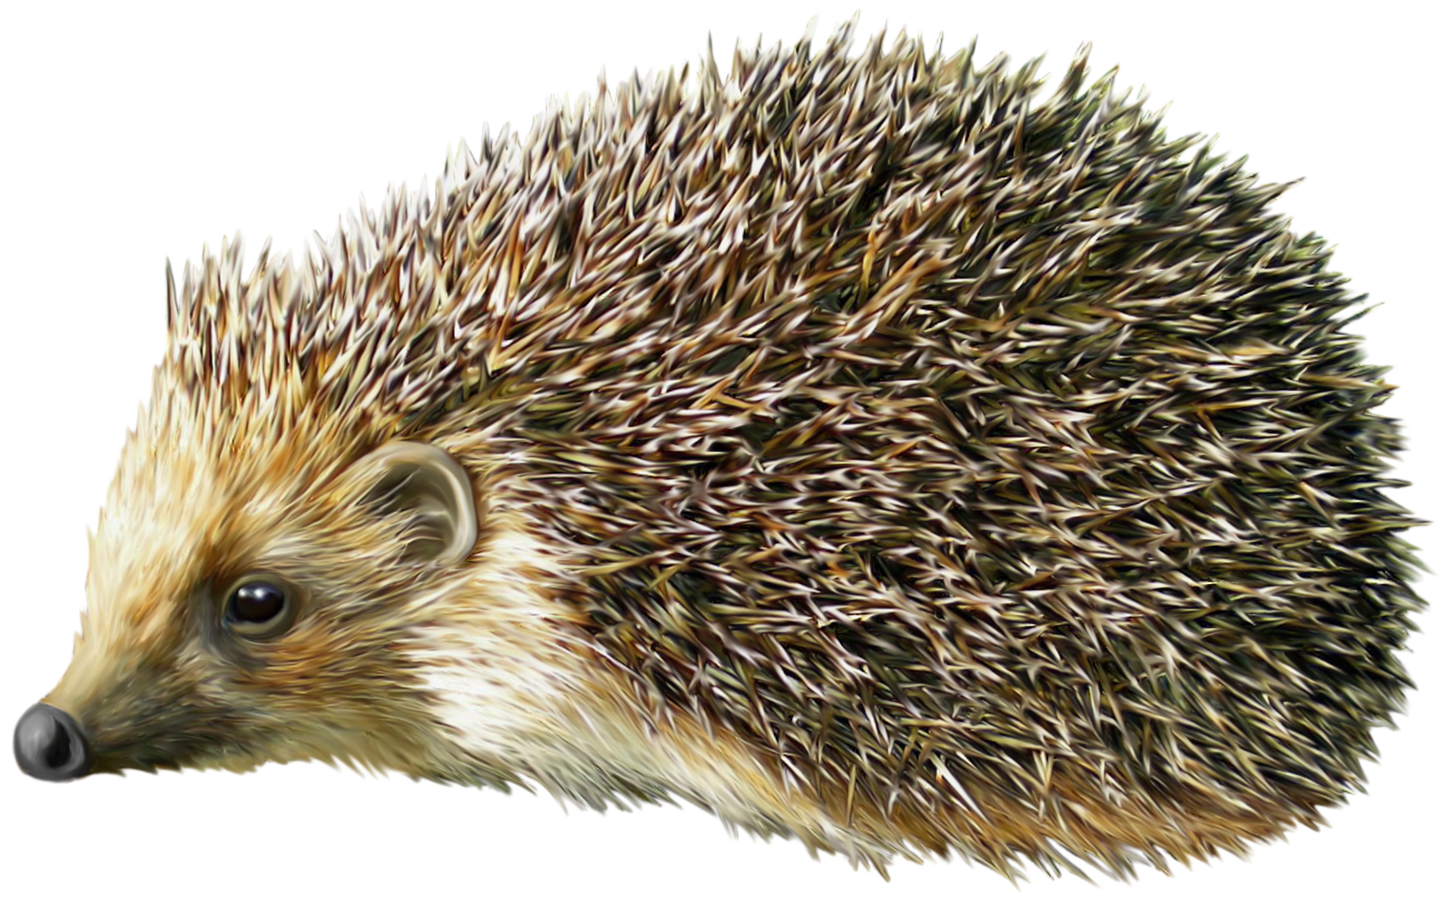 Hedgehog Clipart & Hedgehog Clip Art Images.